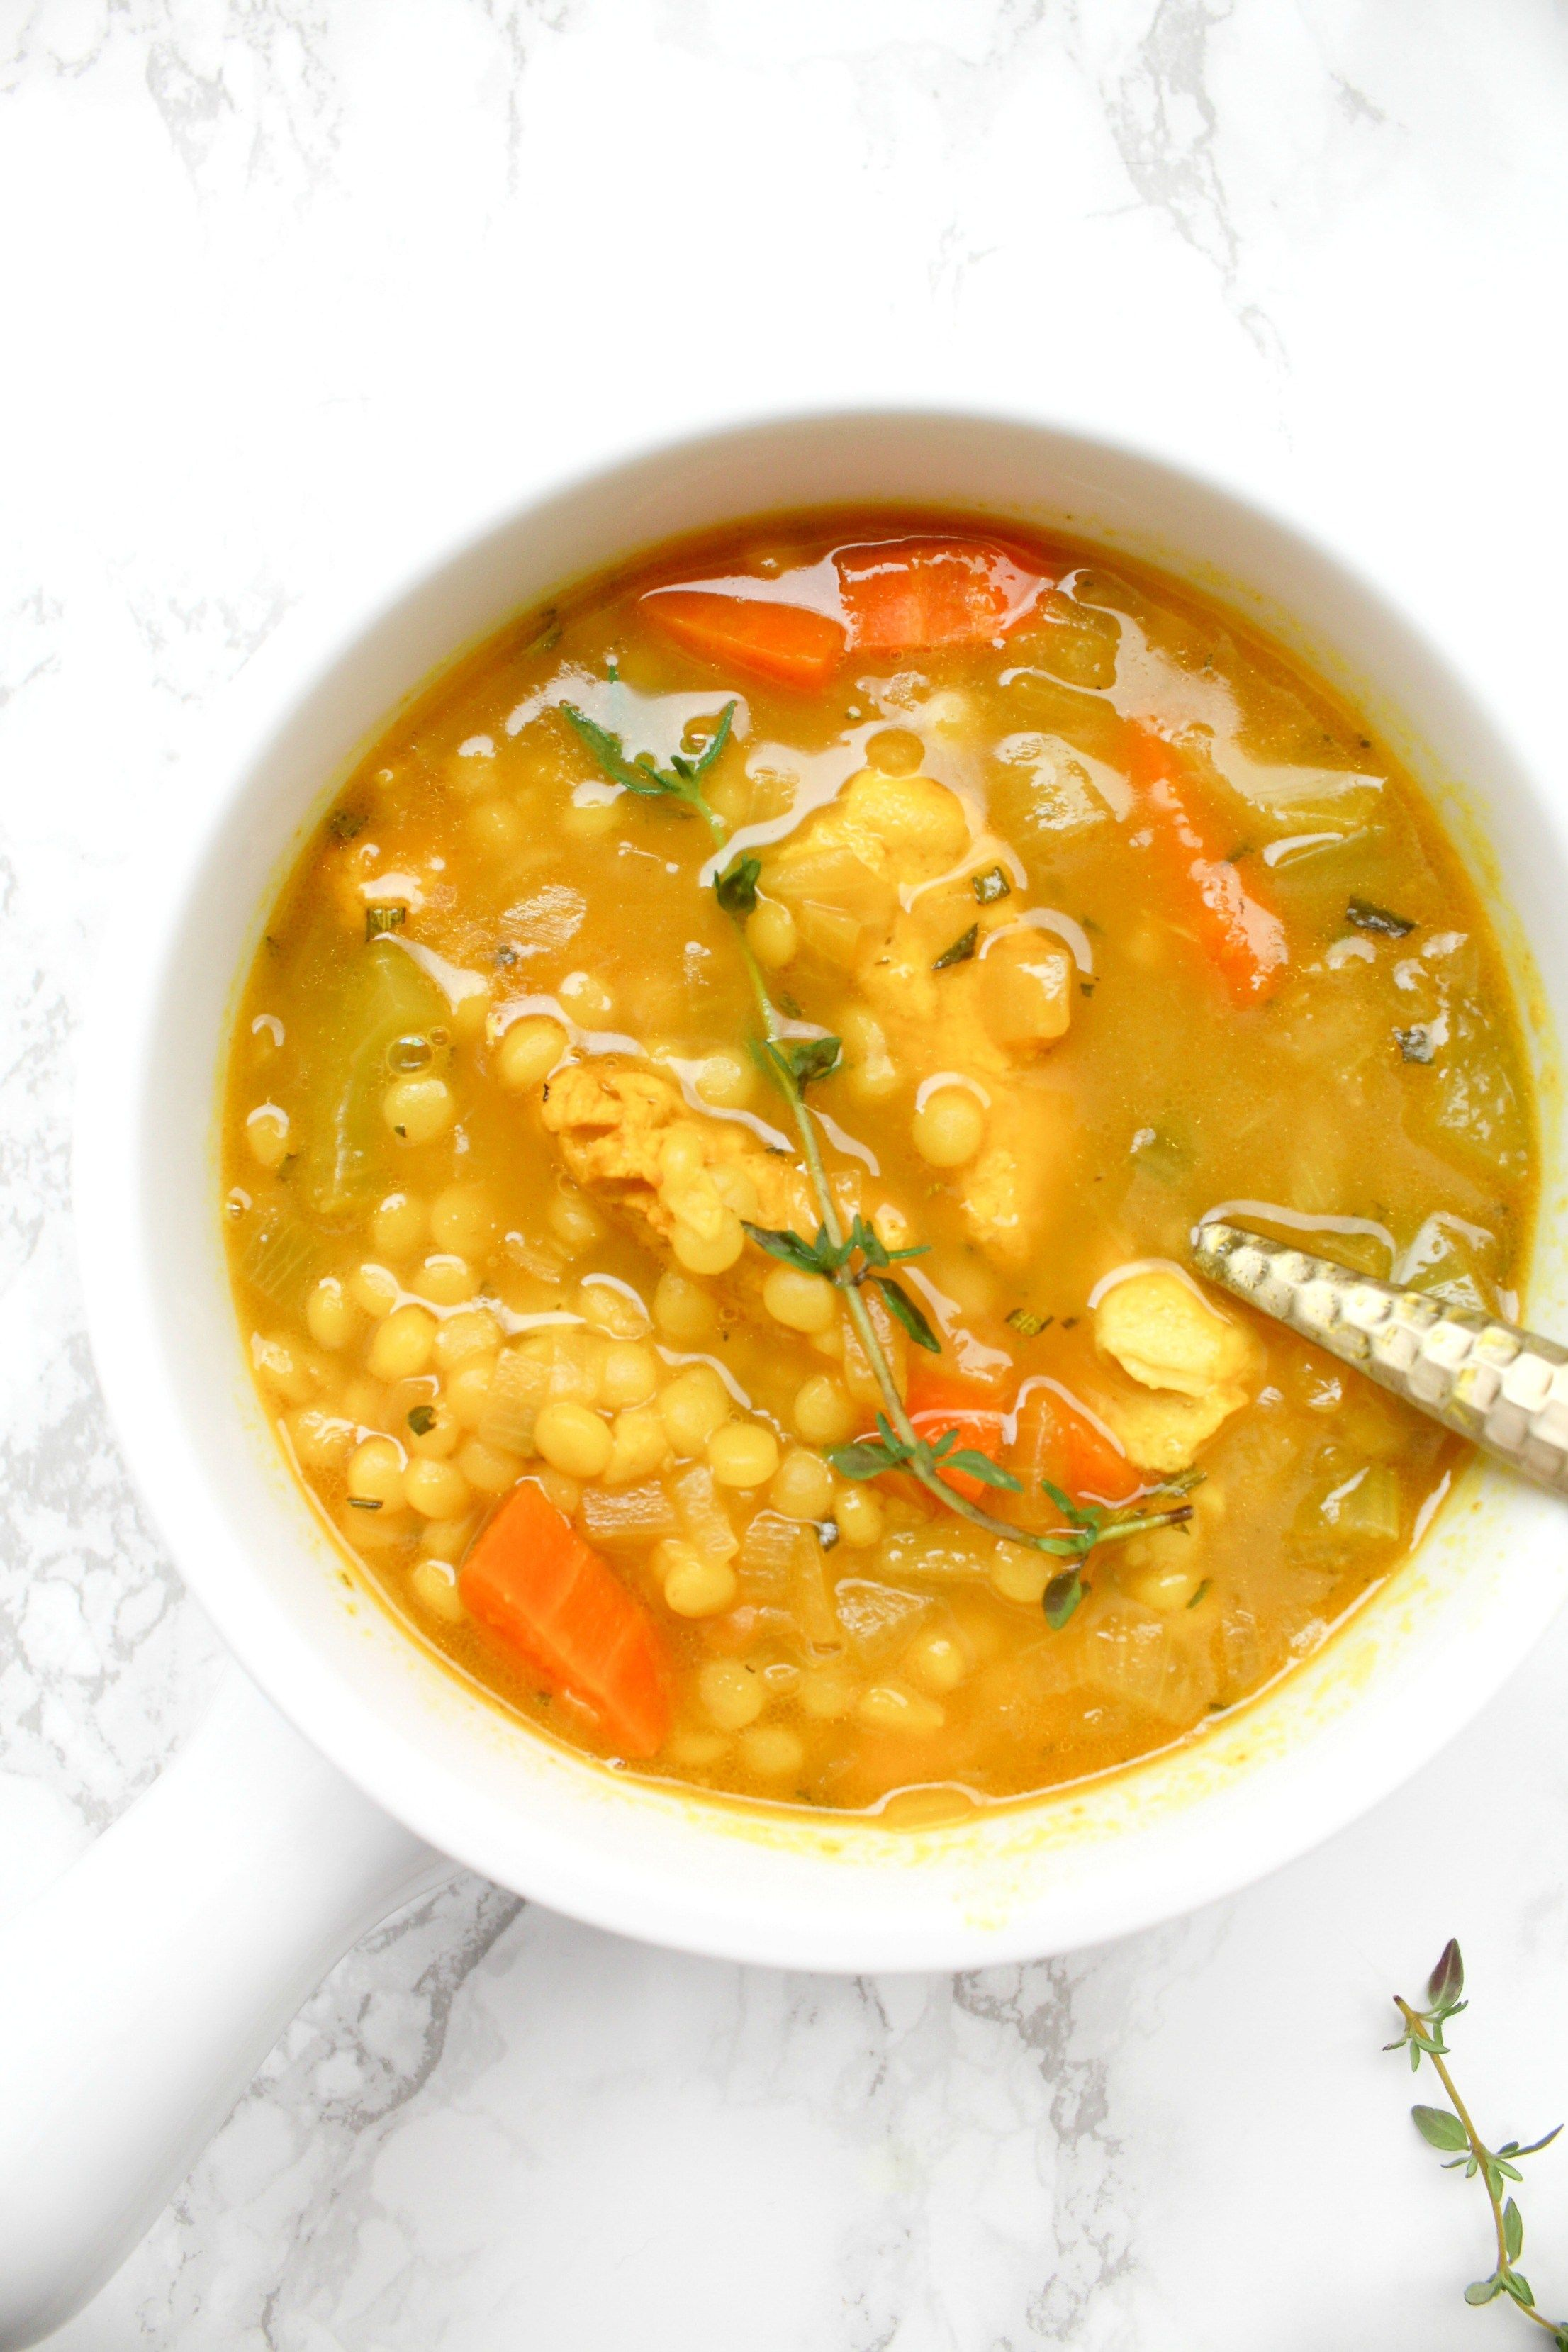 Vegan Chicken Couscous Soup This Savory Vegan Recipe Vegan Dinner Plan Savory Vegan Chicken Couscous